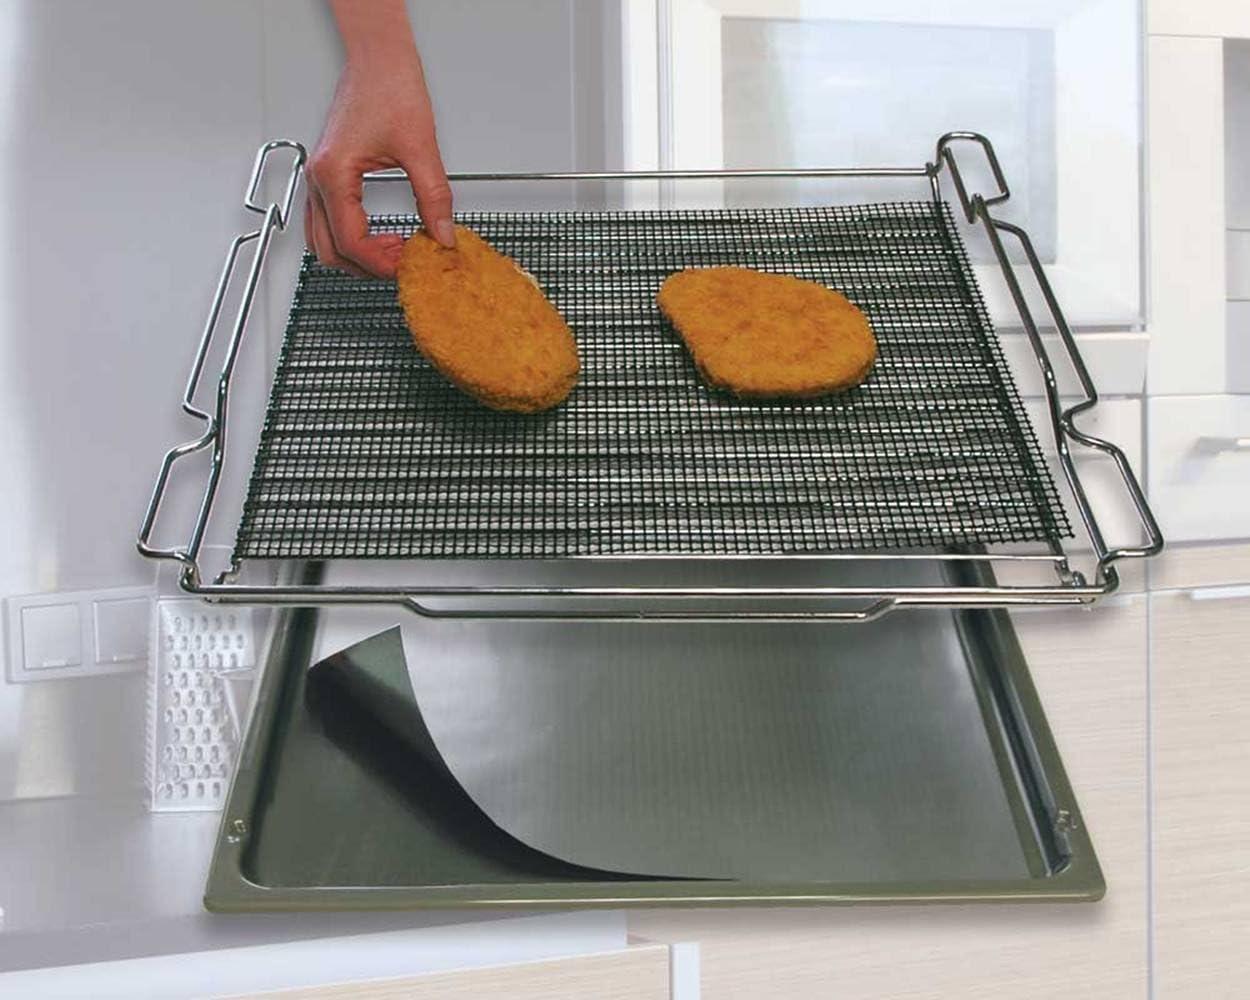 Cooks Innovations - Non-Stick Oven Crisper and Oven Liner Set